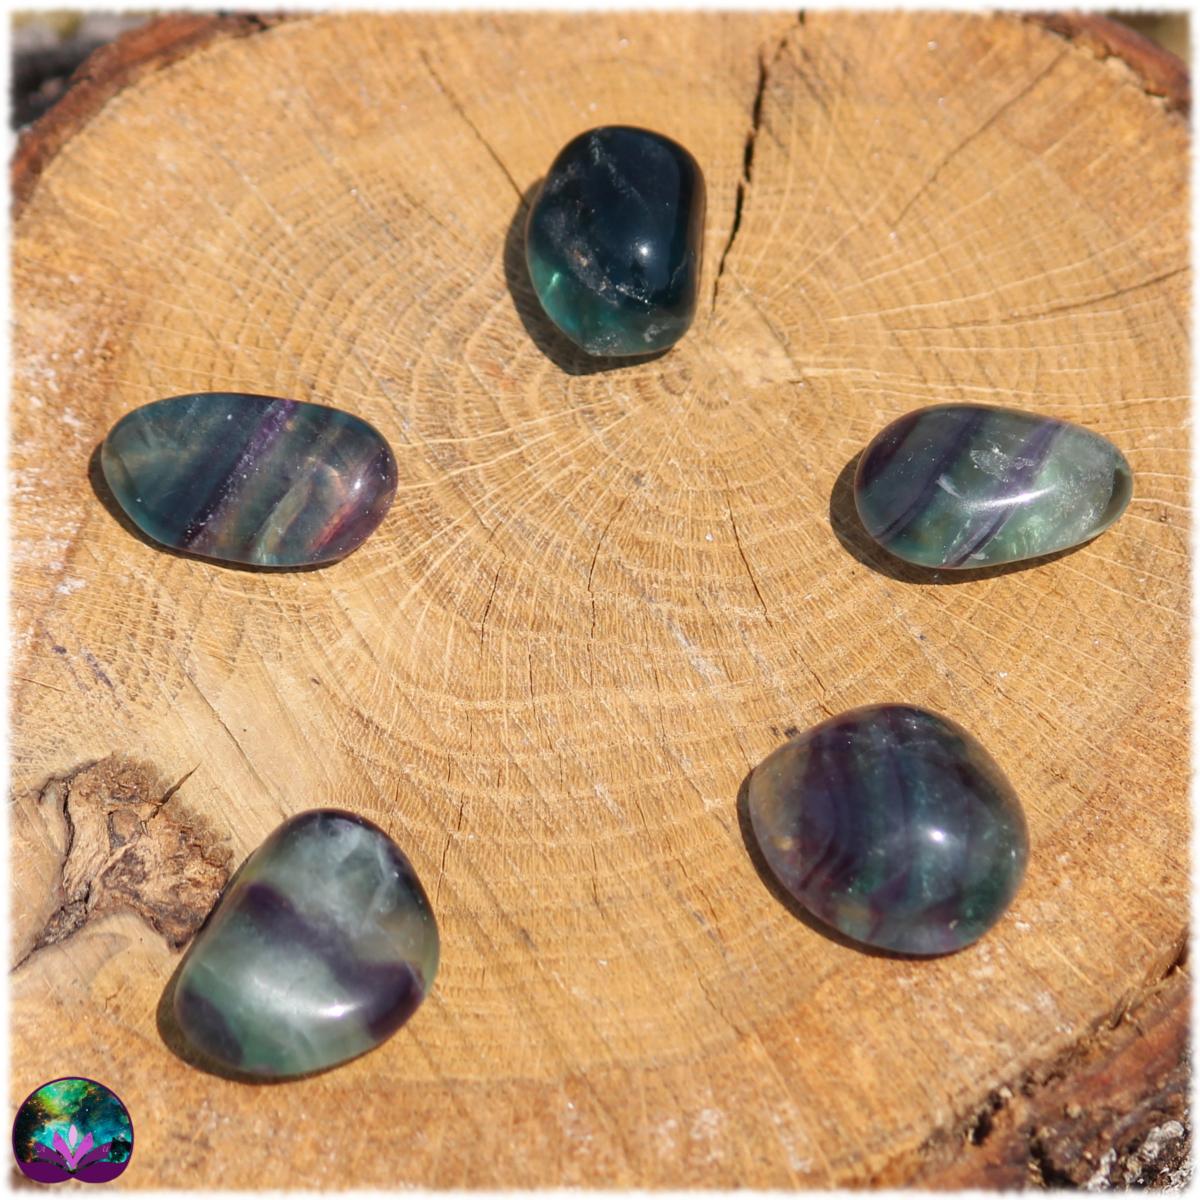 Fluorite multicolore roulée majoritairement verte